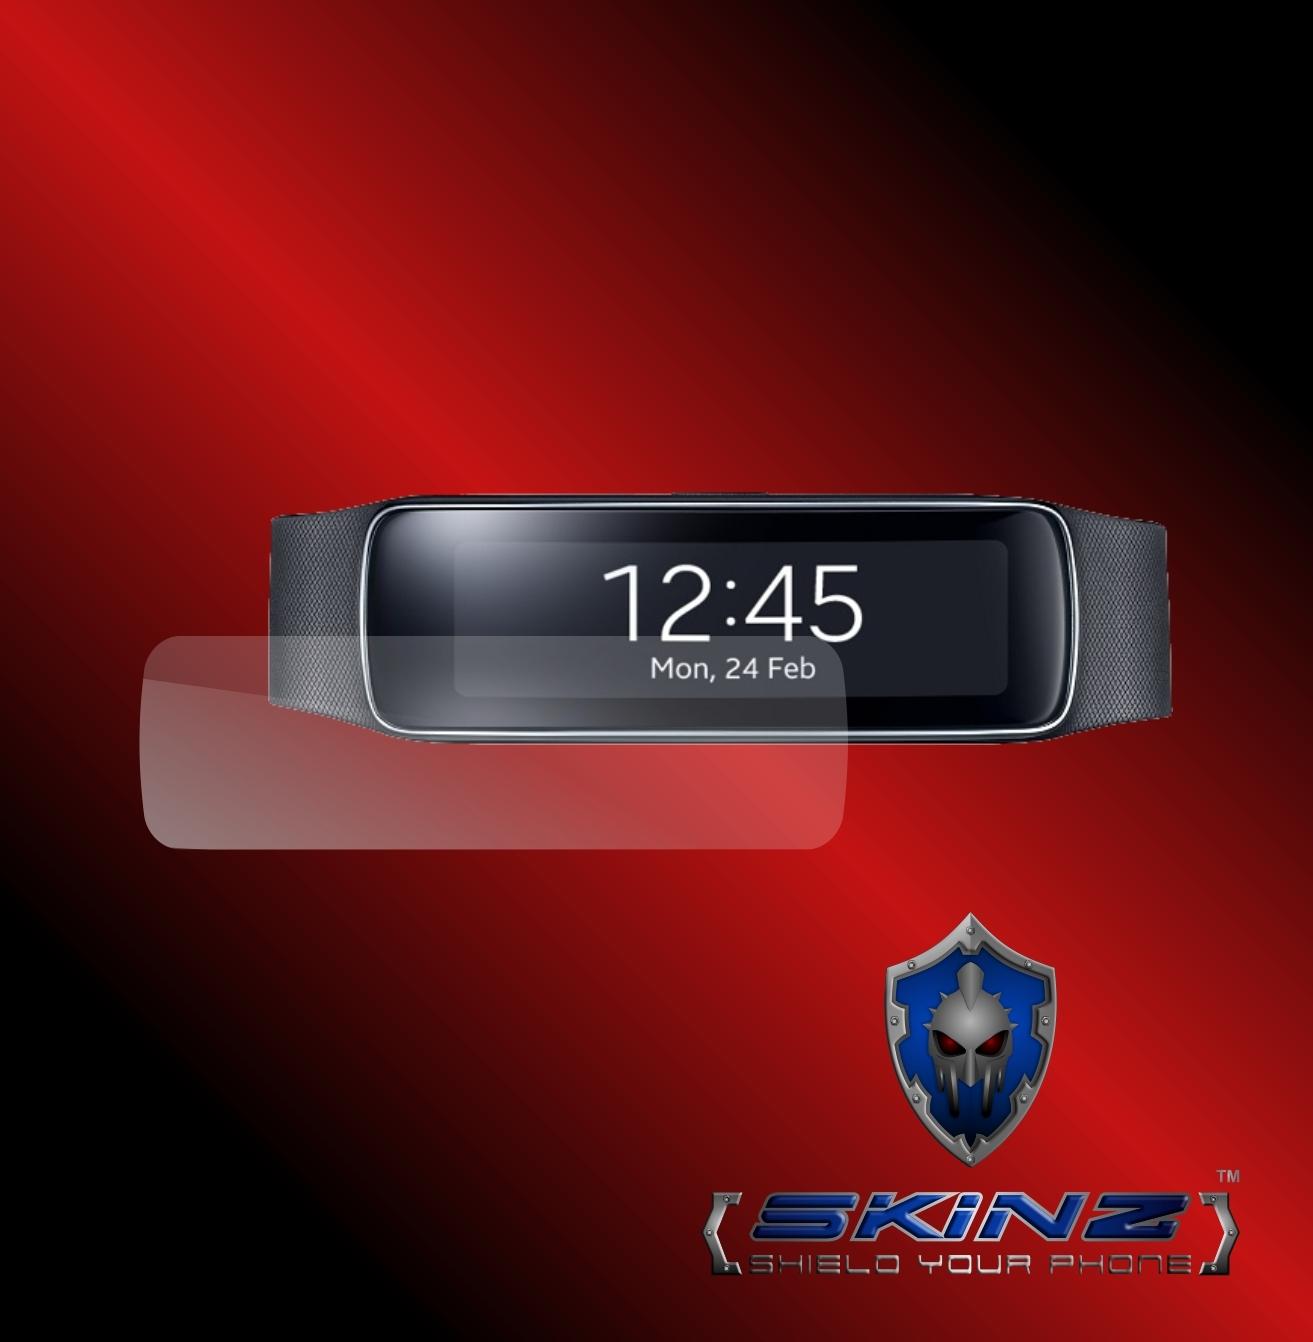 Samsung galaxy gear fit self healing screen protector